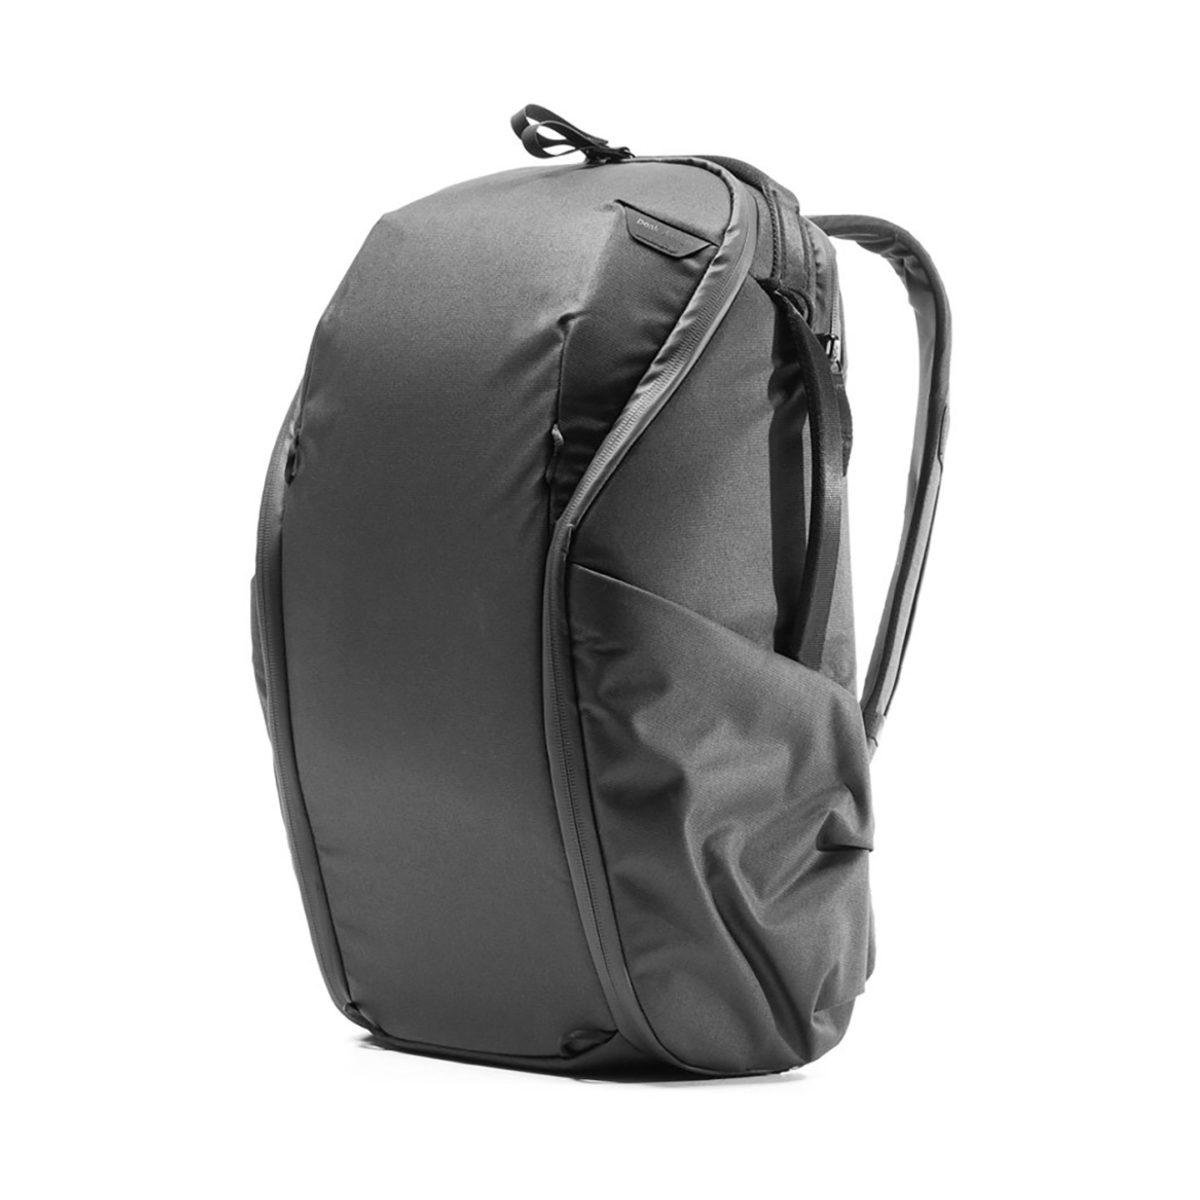 peak_design_everyday_backpack_zip_v2_02